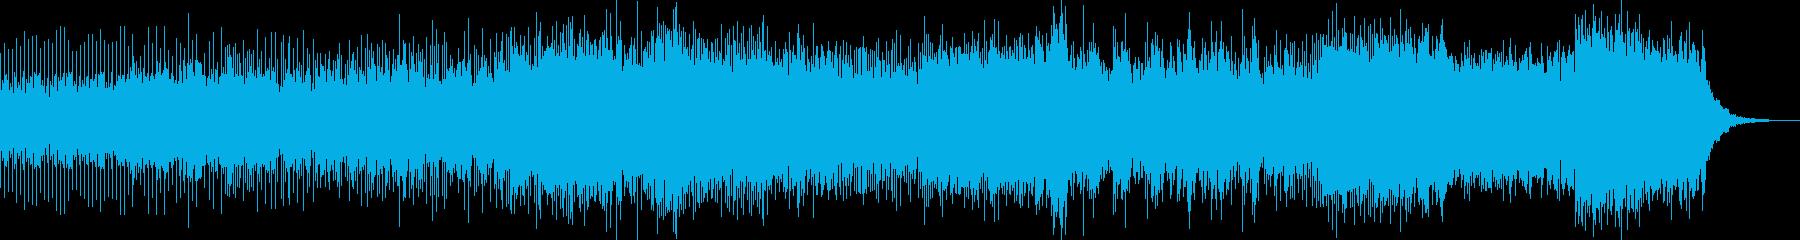 J-POPなかんじの再生済みの波形